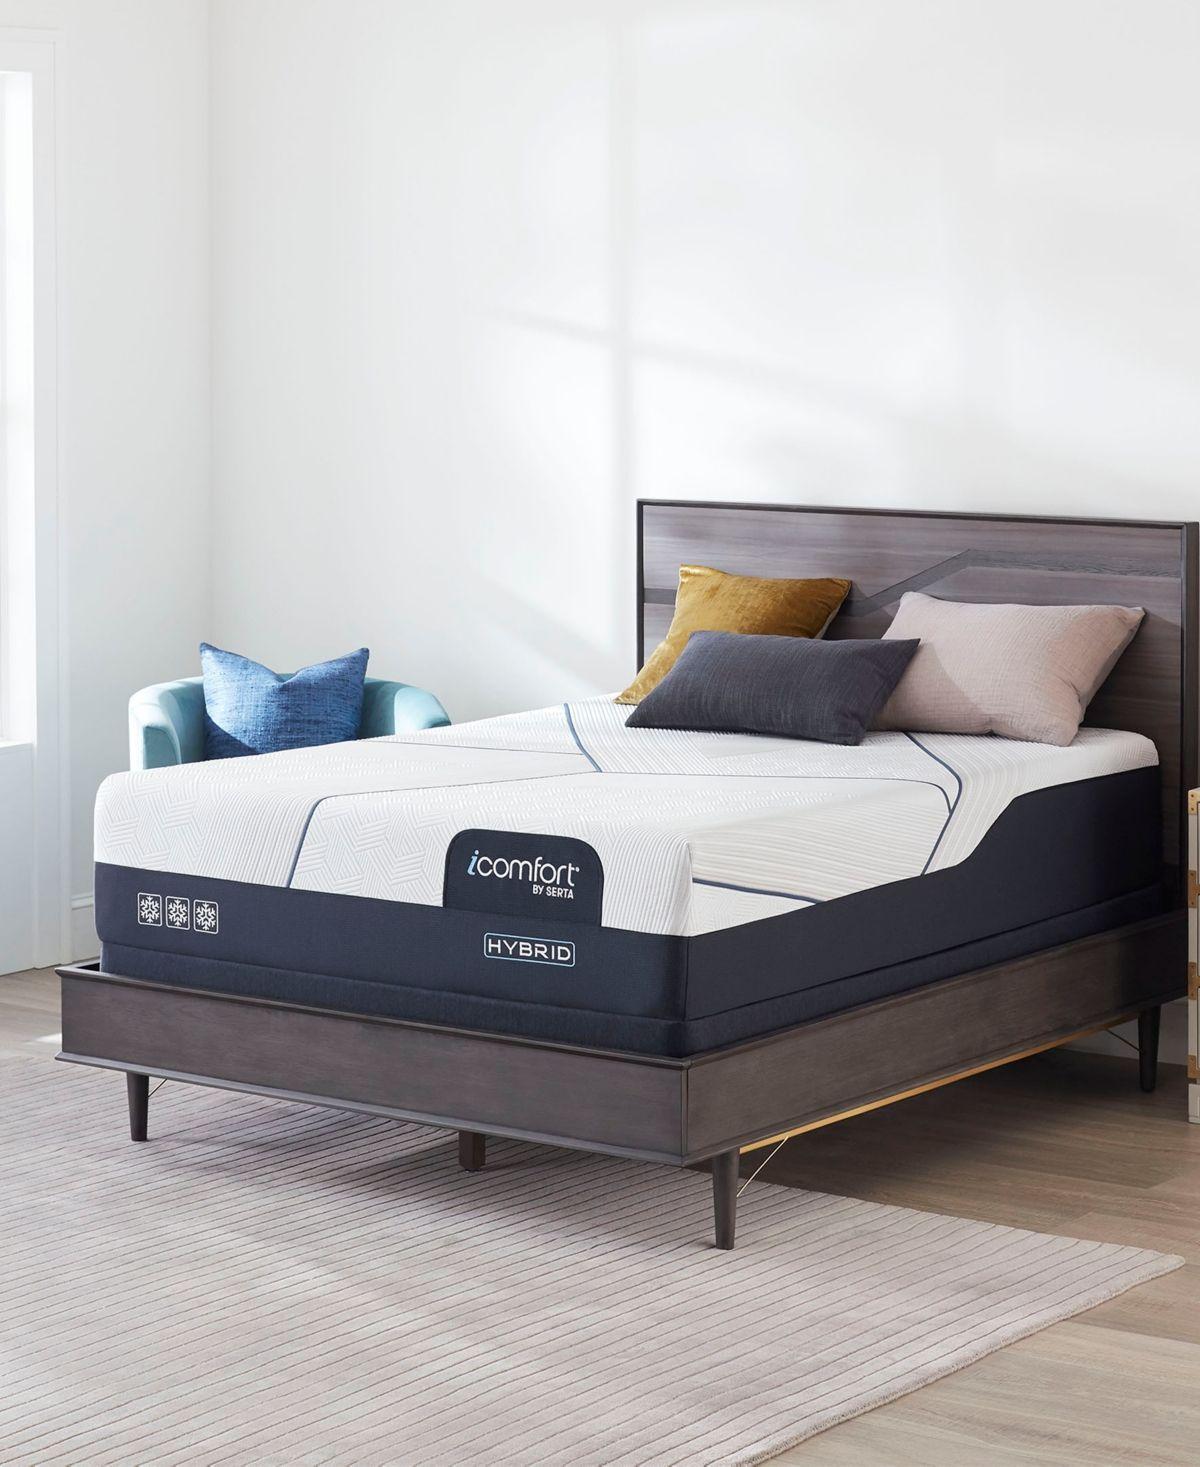 Serta Icomfort Cf 3000 13 5 Hybrid Plush Mattress Set